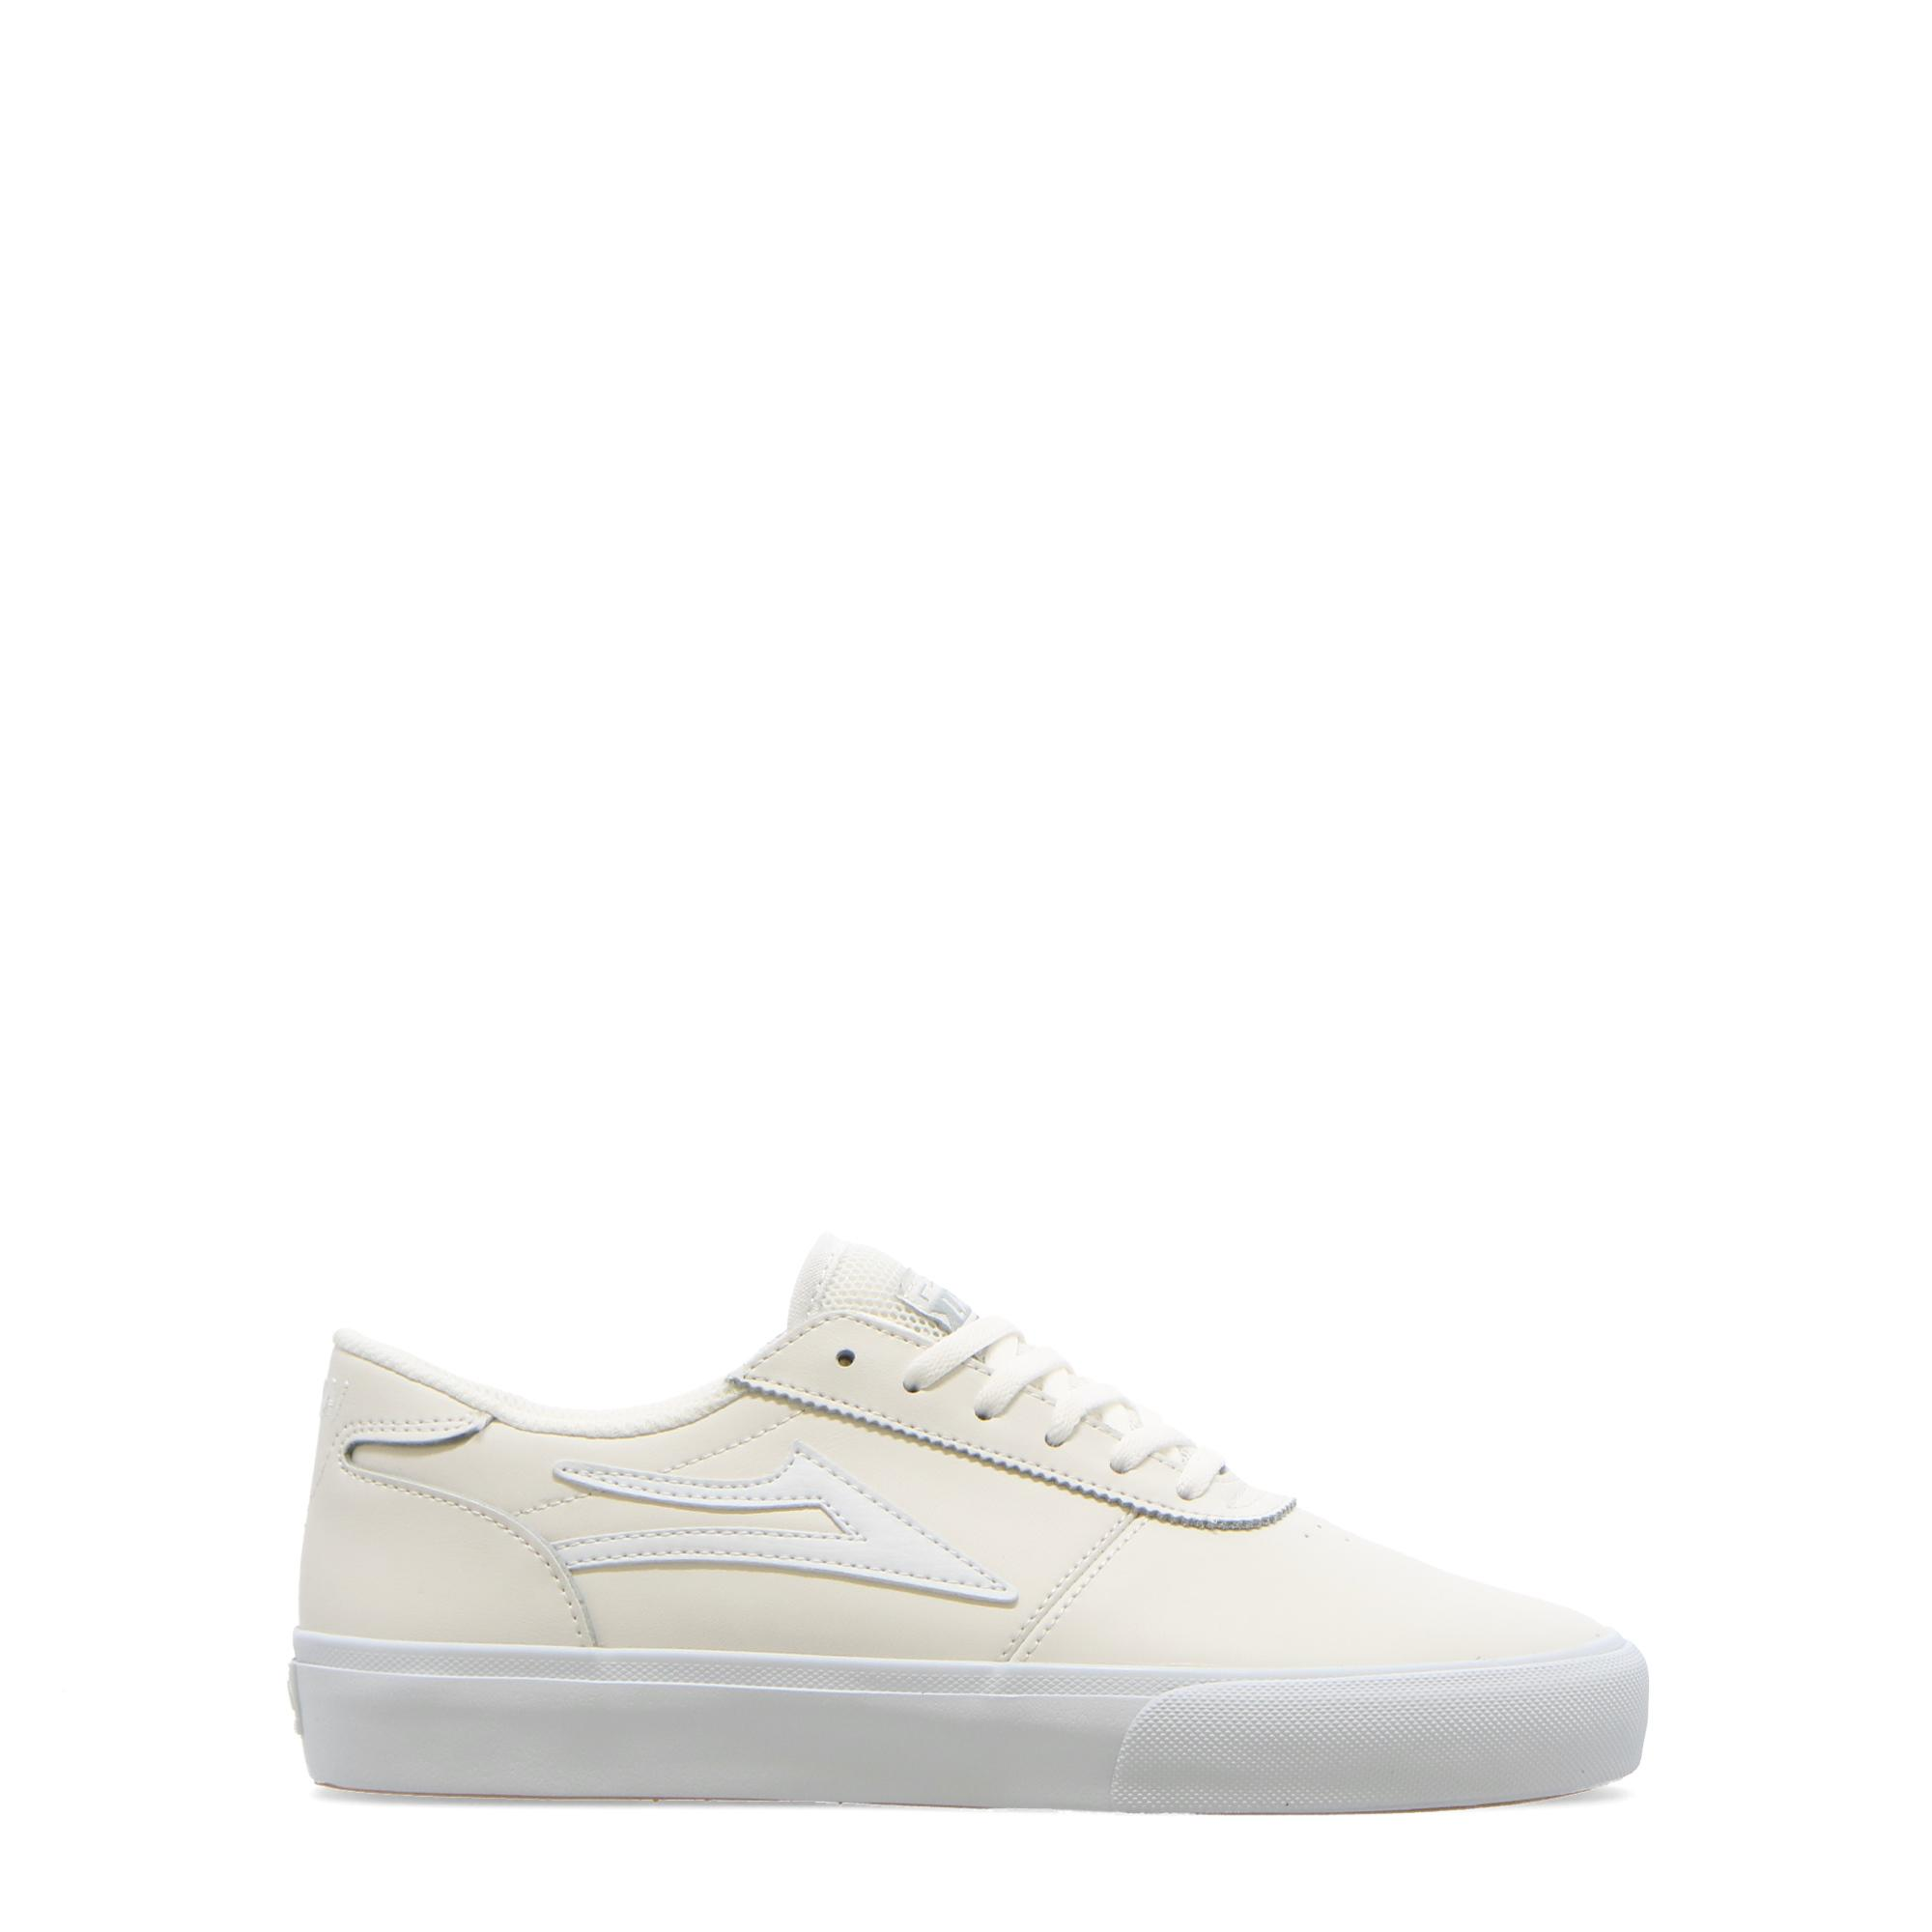 Lakai Manchester White leather